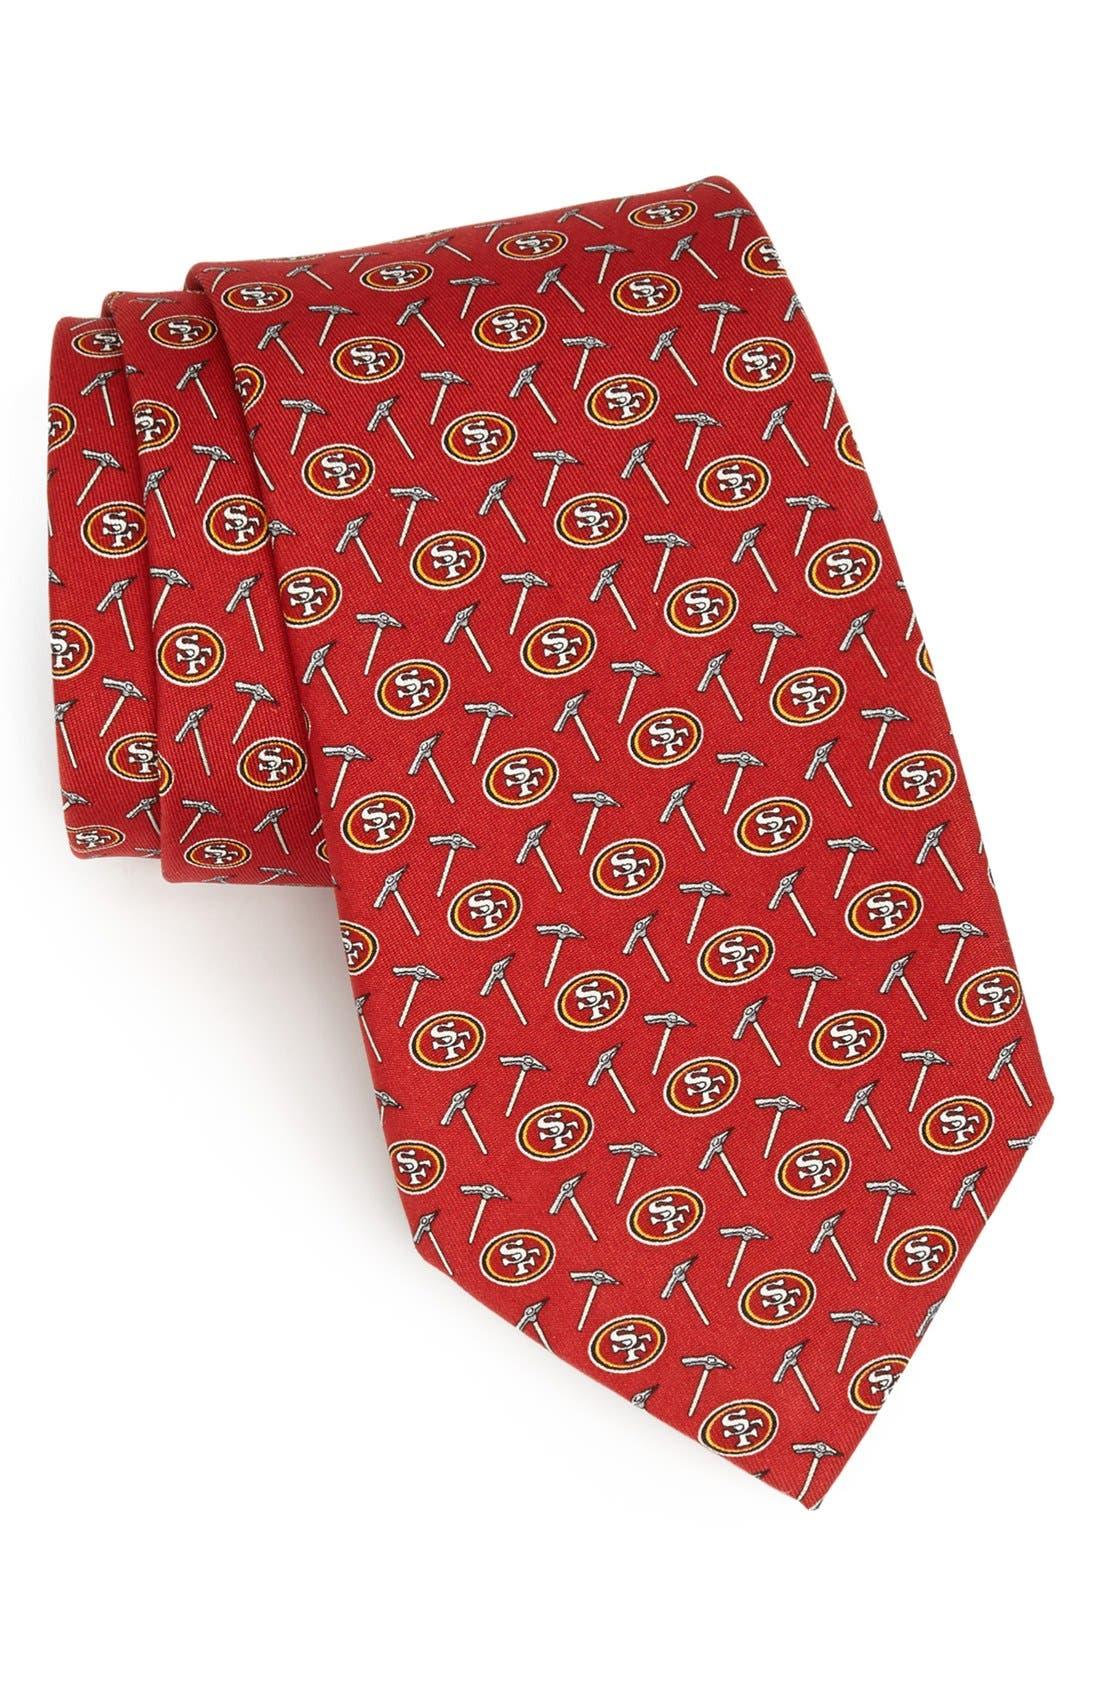 San Francisco 49ers Print Tie,                             Main thumbnail 1, color,                             RED